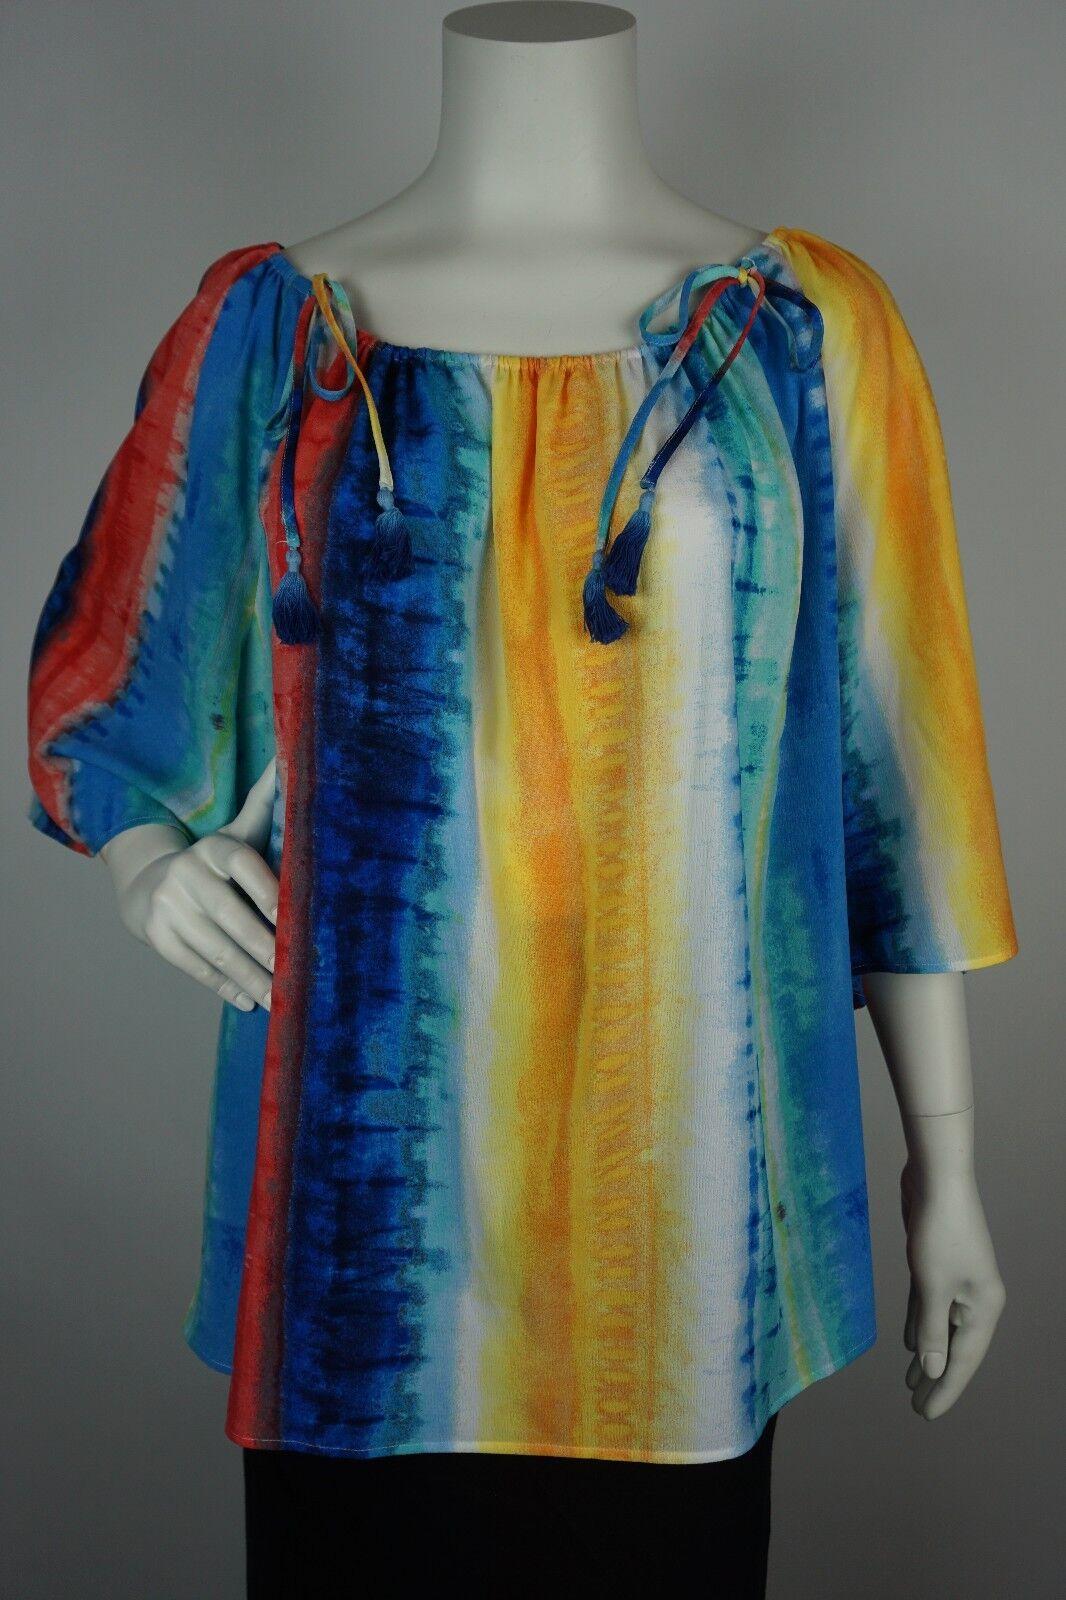 Rafaella Womens Peasant Blouse Shirt Top Bright colorful Plus Size 3X (WW29)